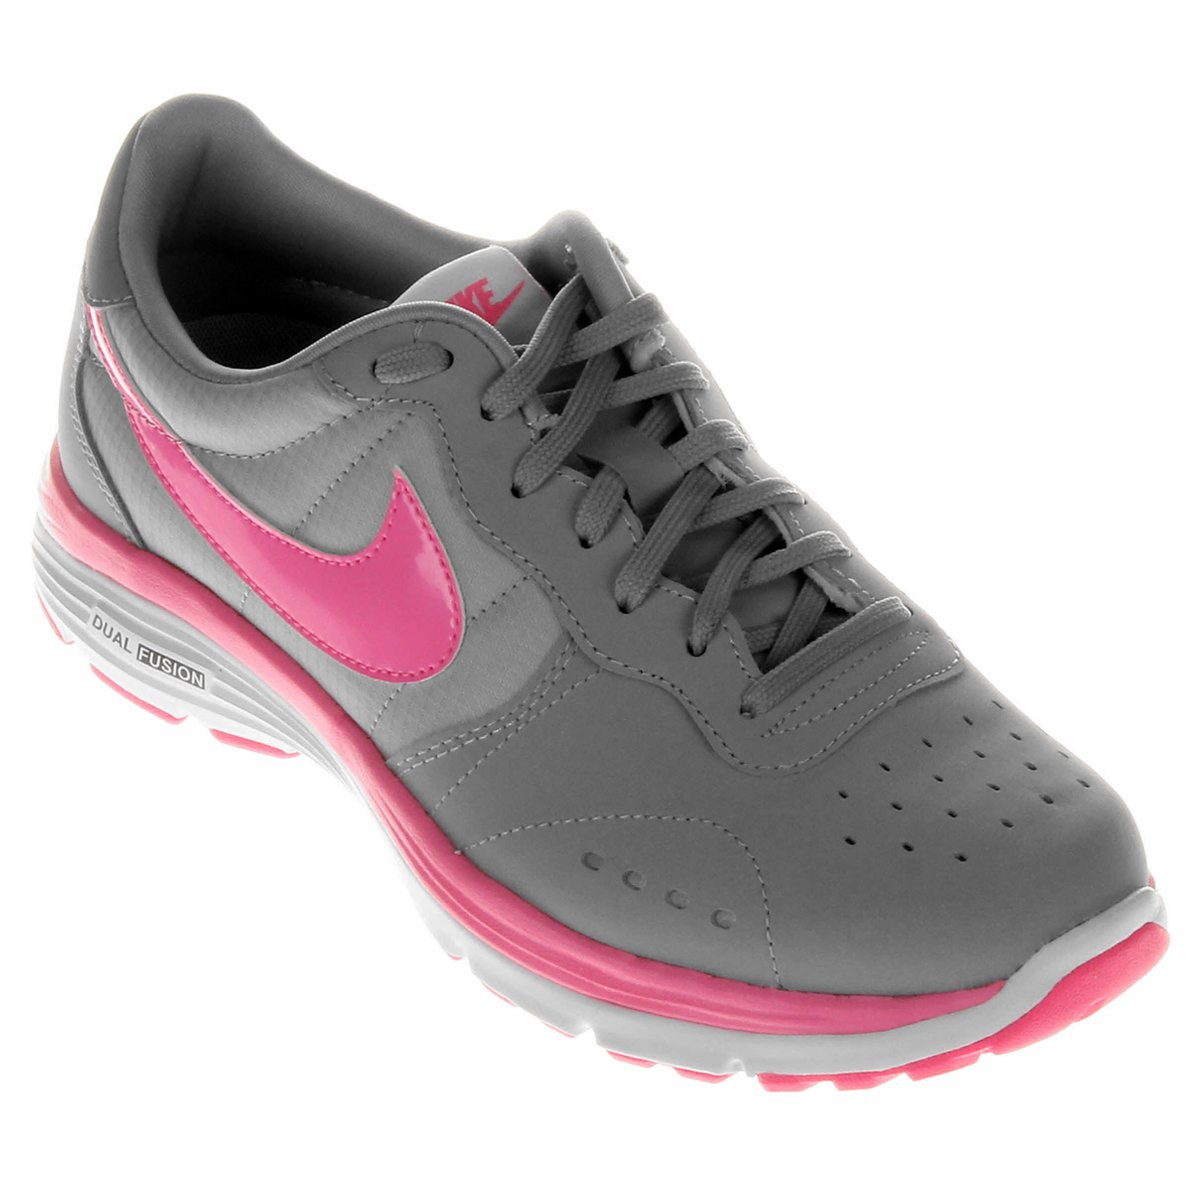 c4914d2751d Tênis Nike Dual Fusion - Compre Agora